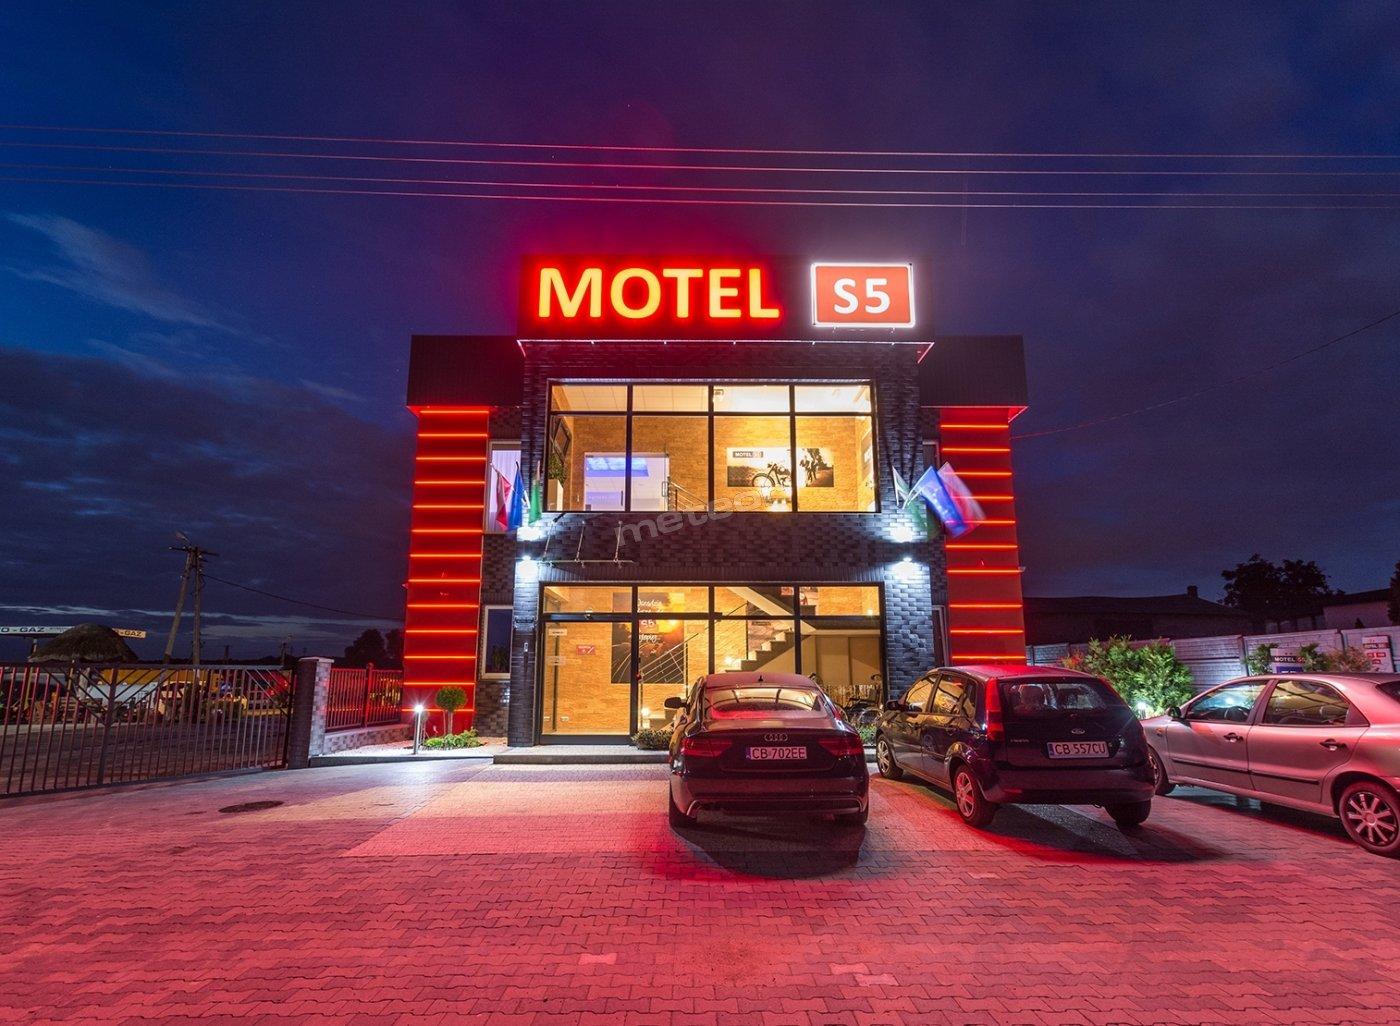 Motel s5